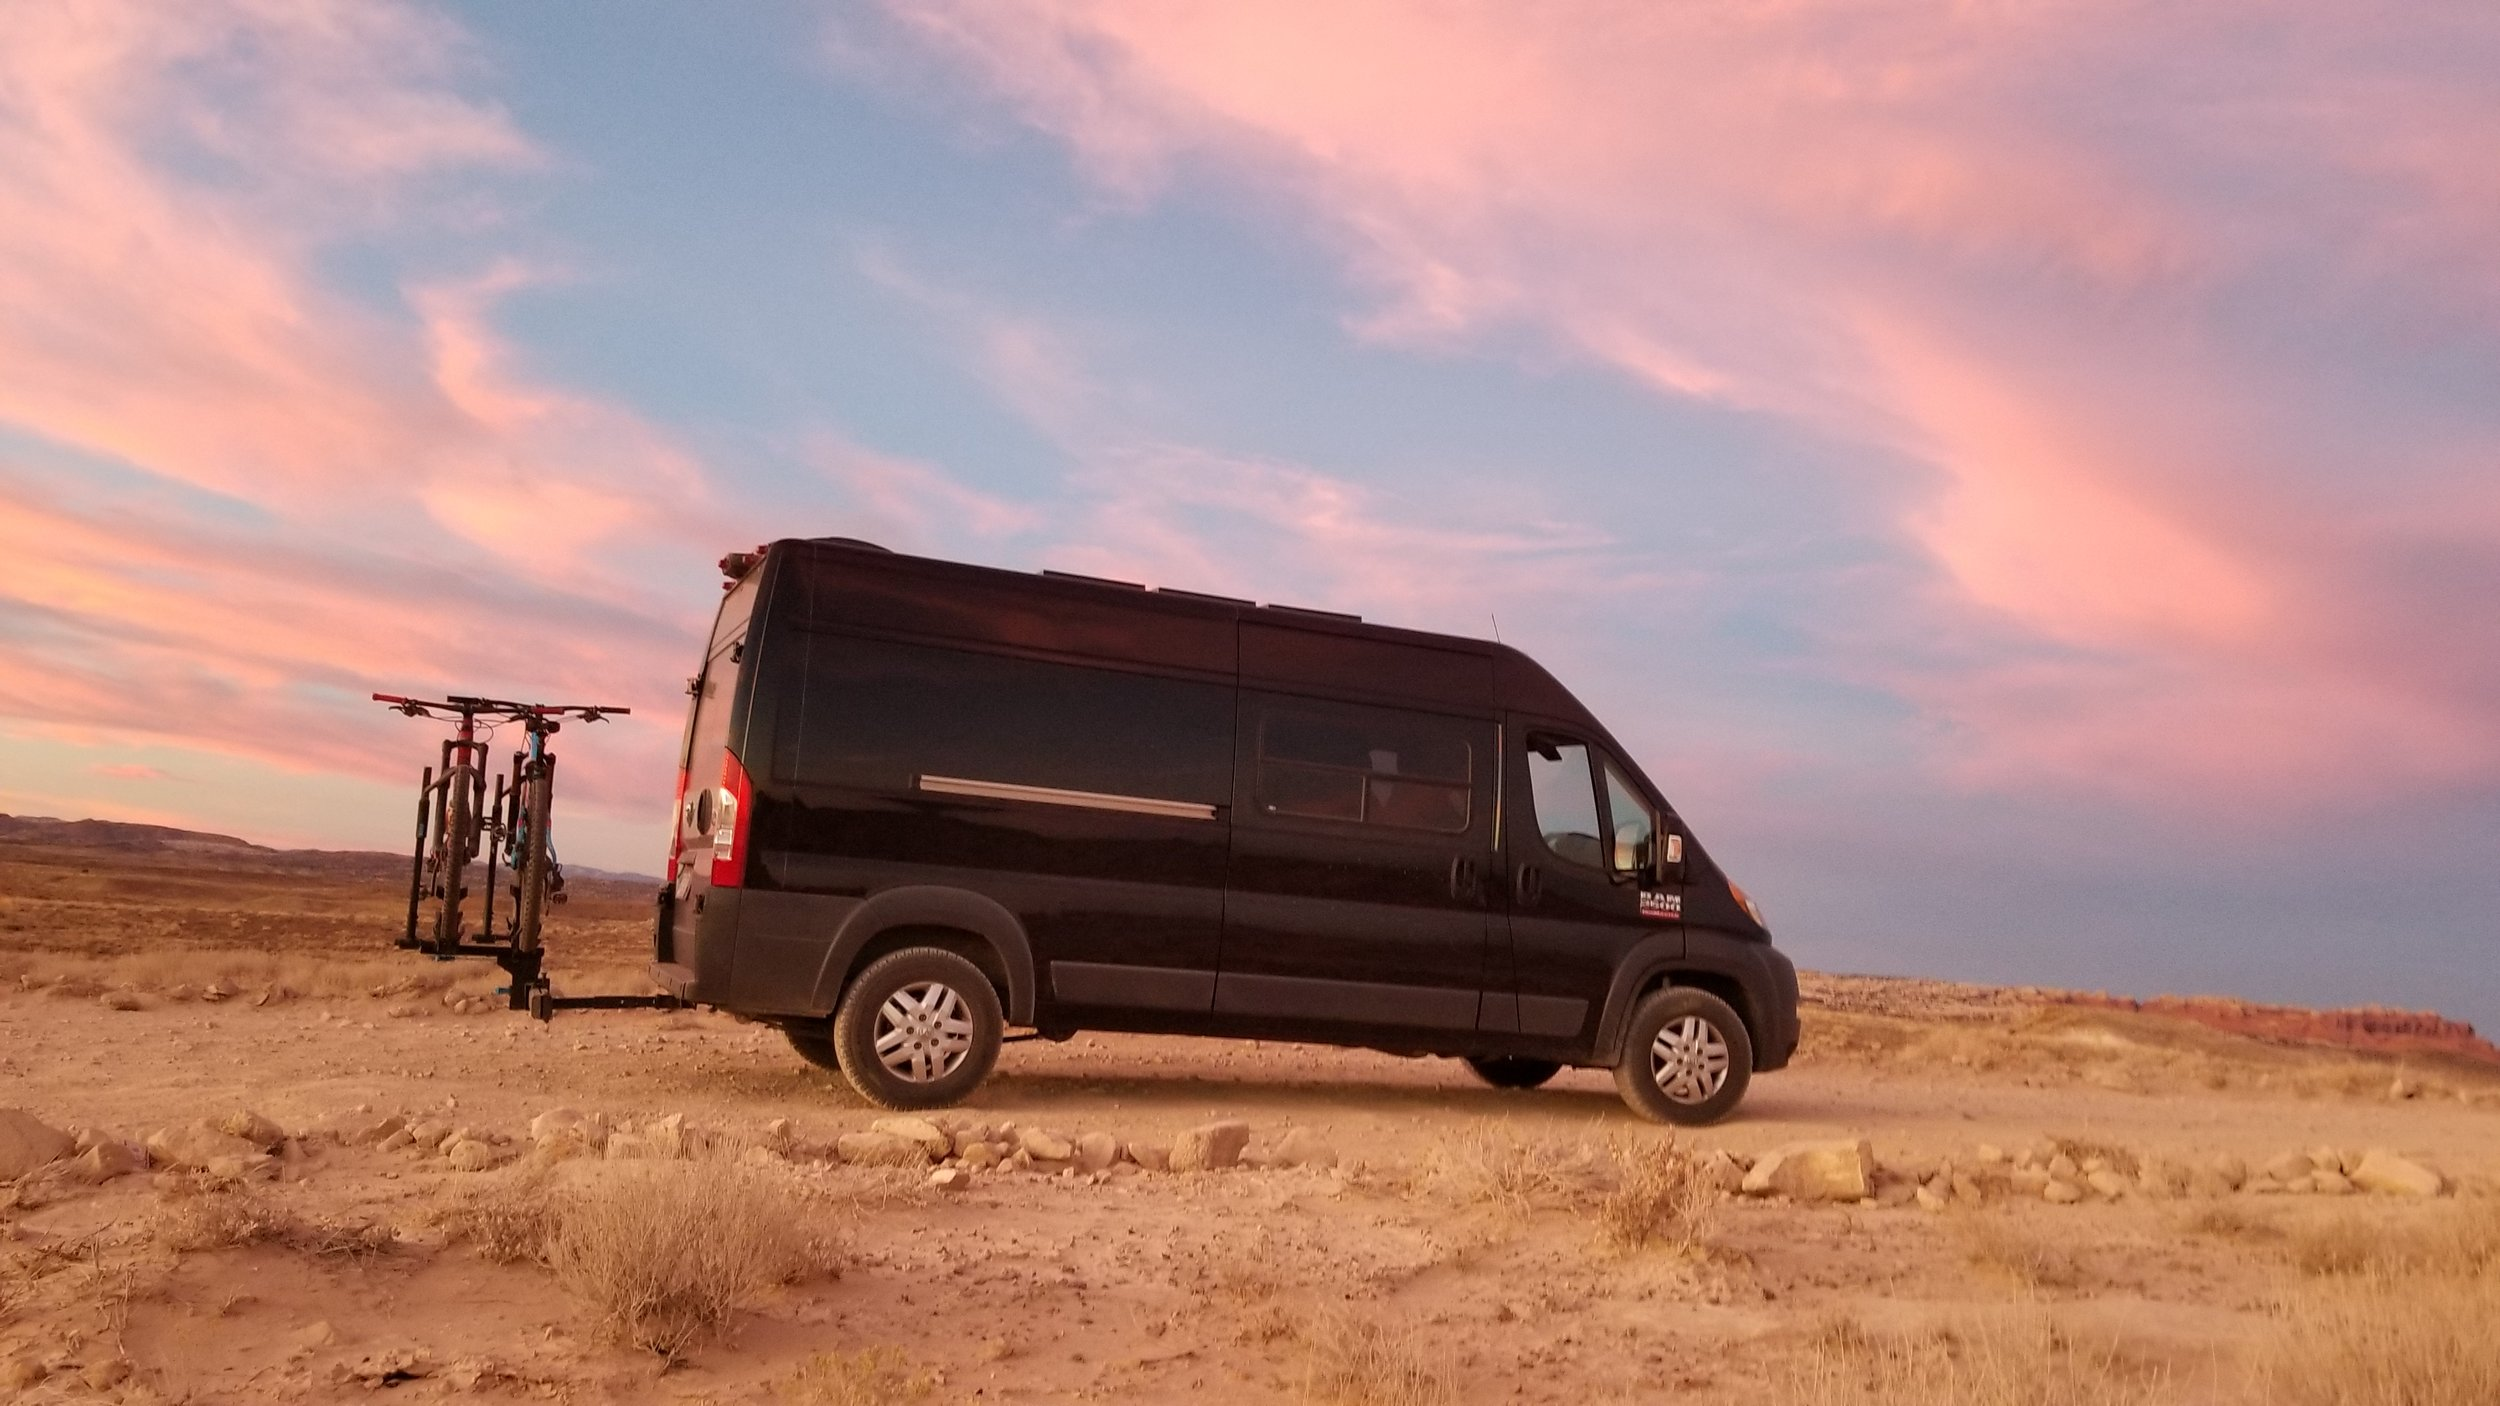 Promaster Camper Van Conversion For Sale